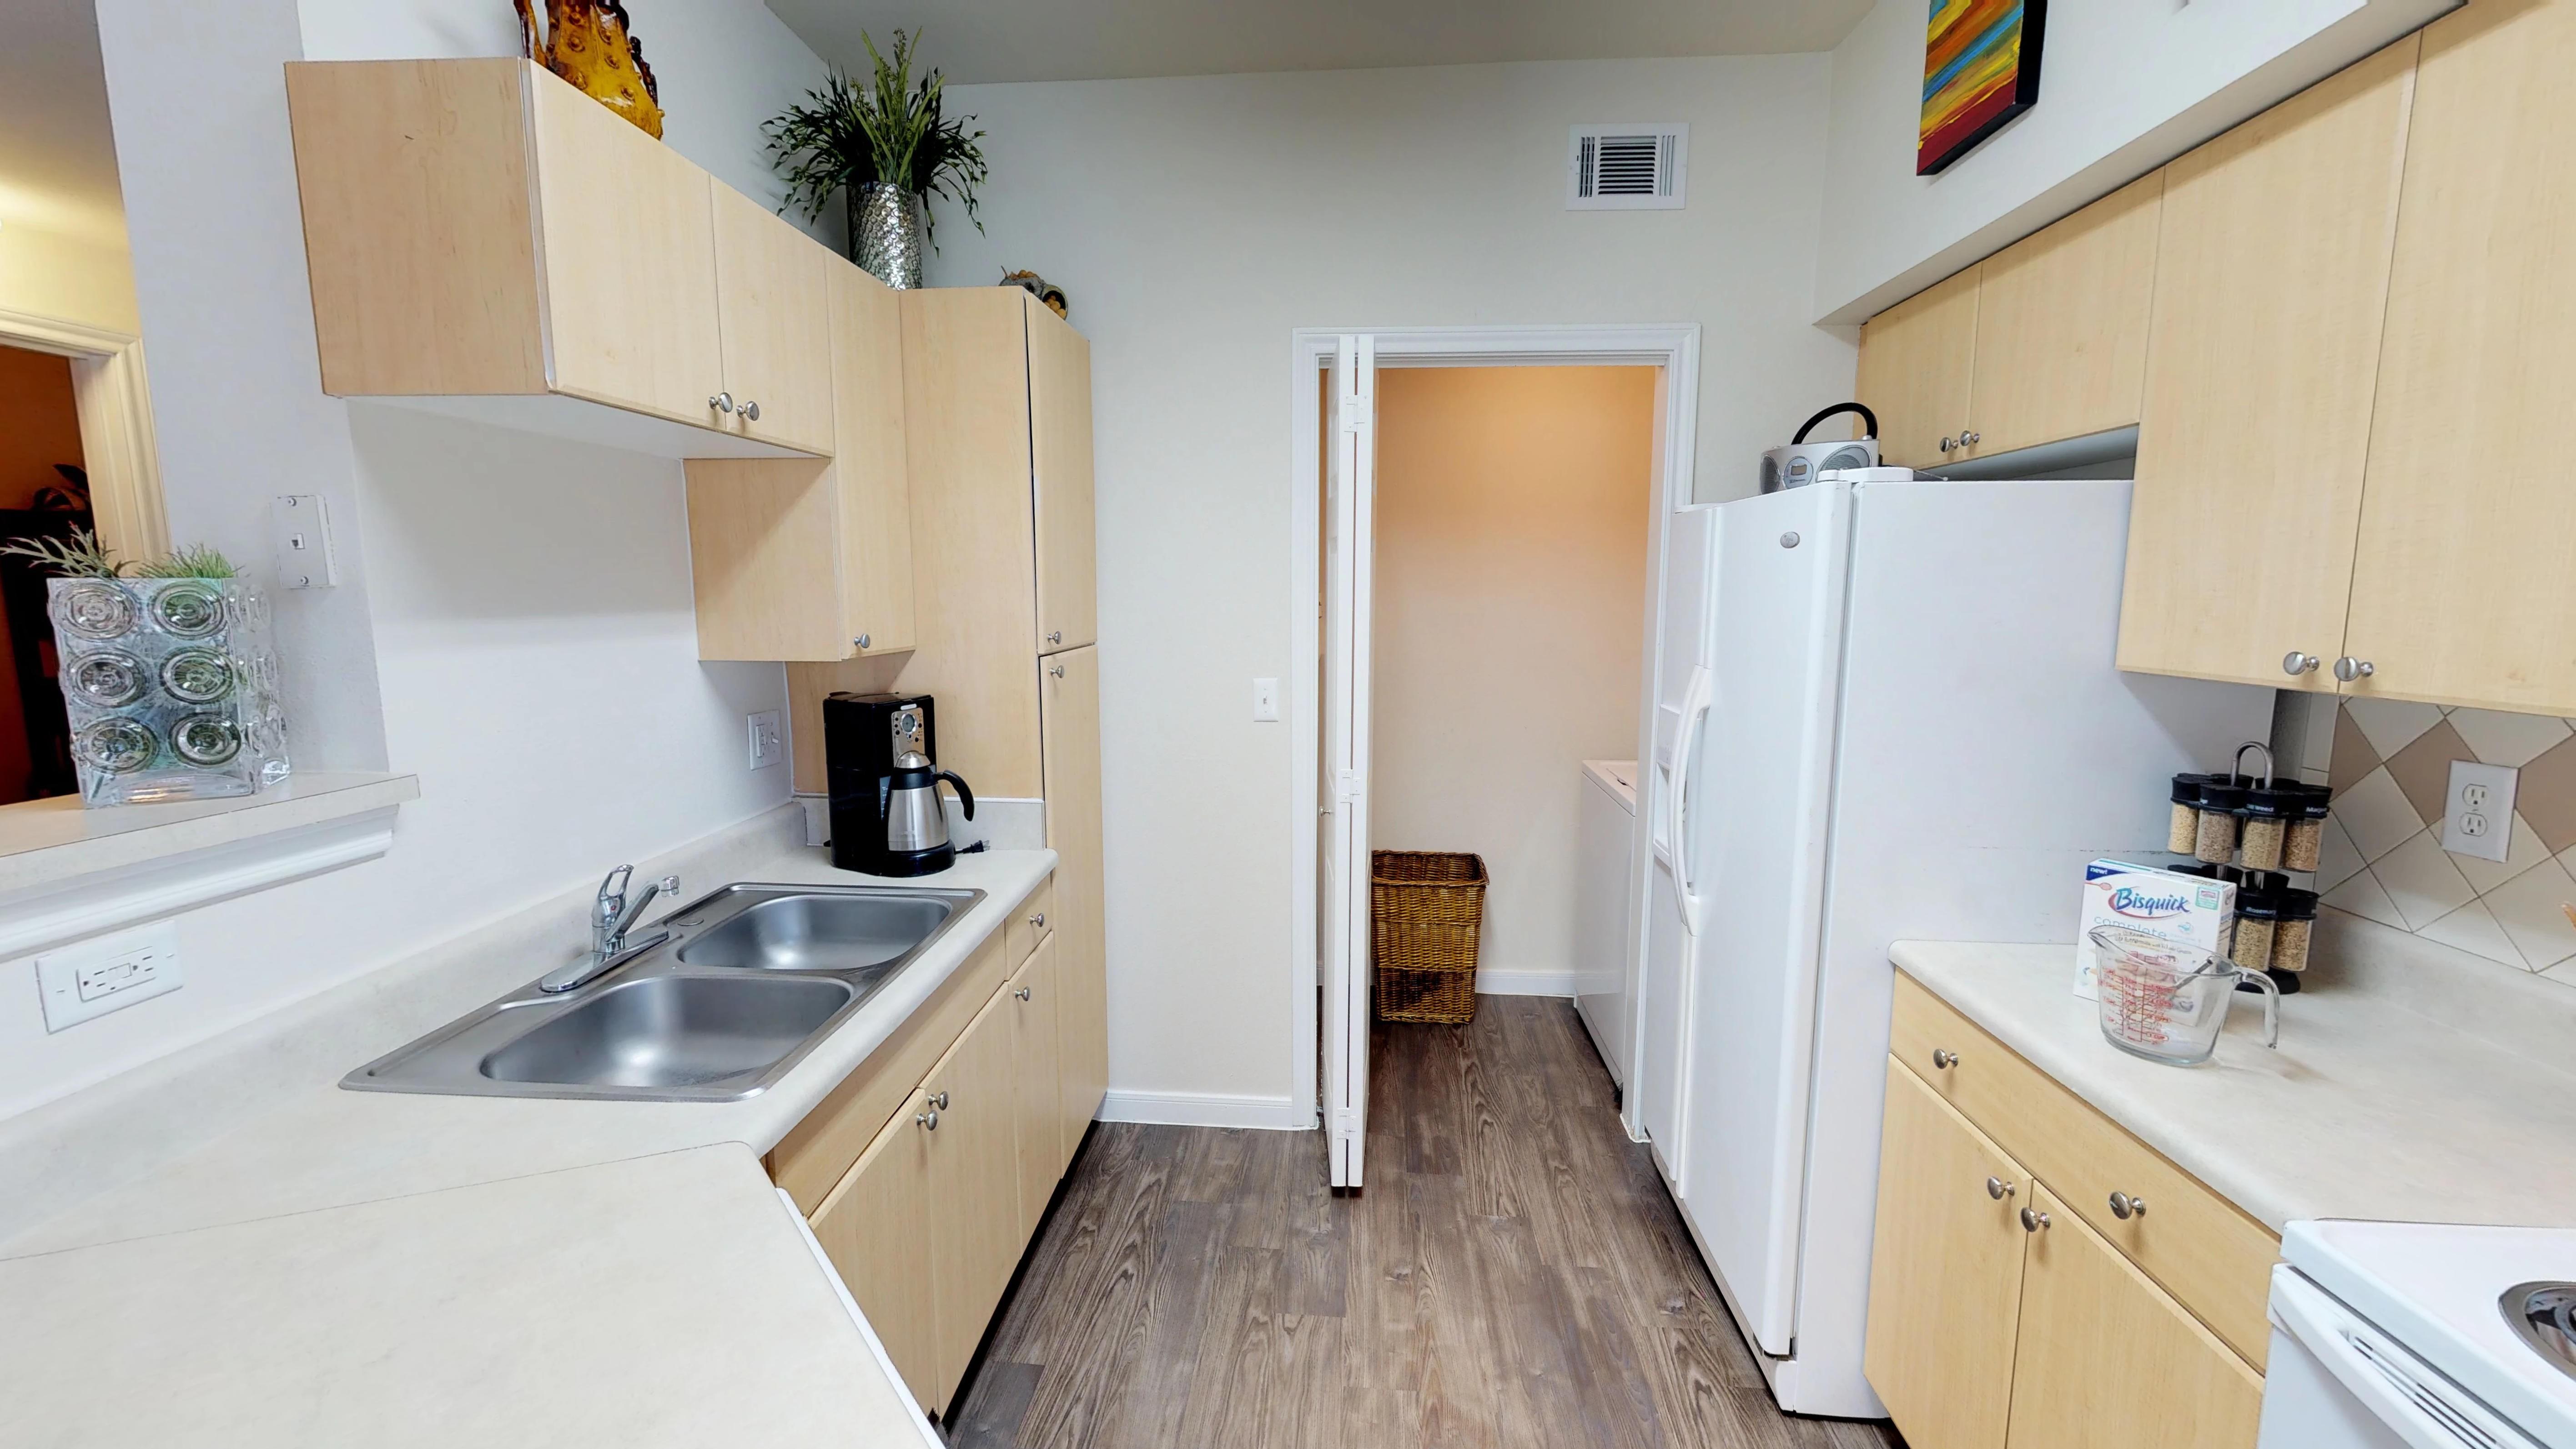 Gulf Breeze Apartments rental